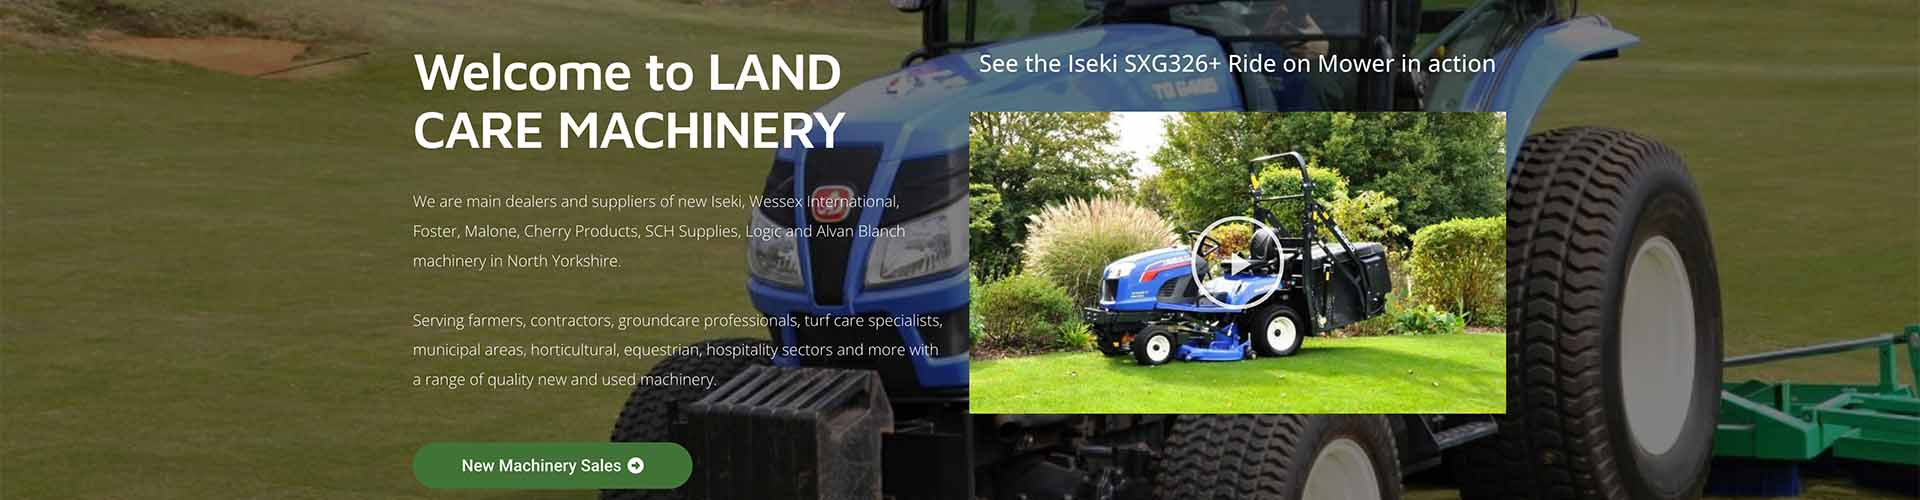 Web Design UK Portfolio Land Care Machinery